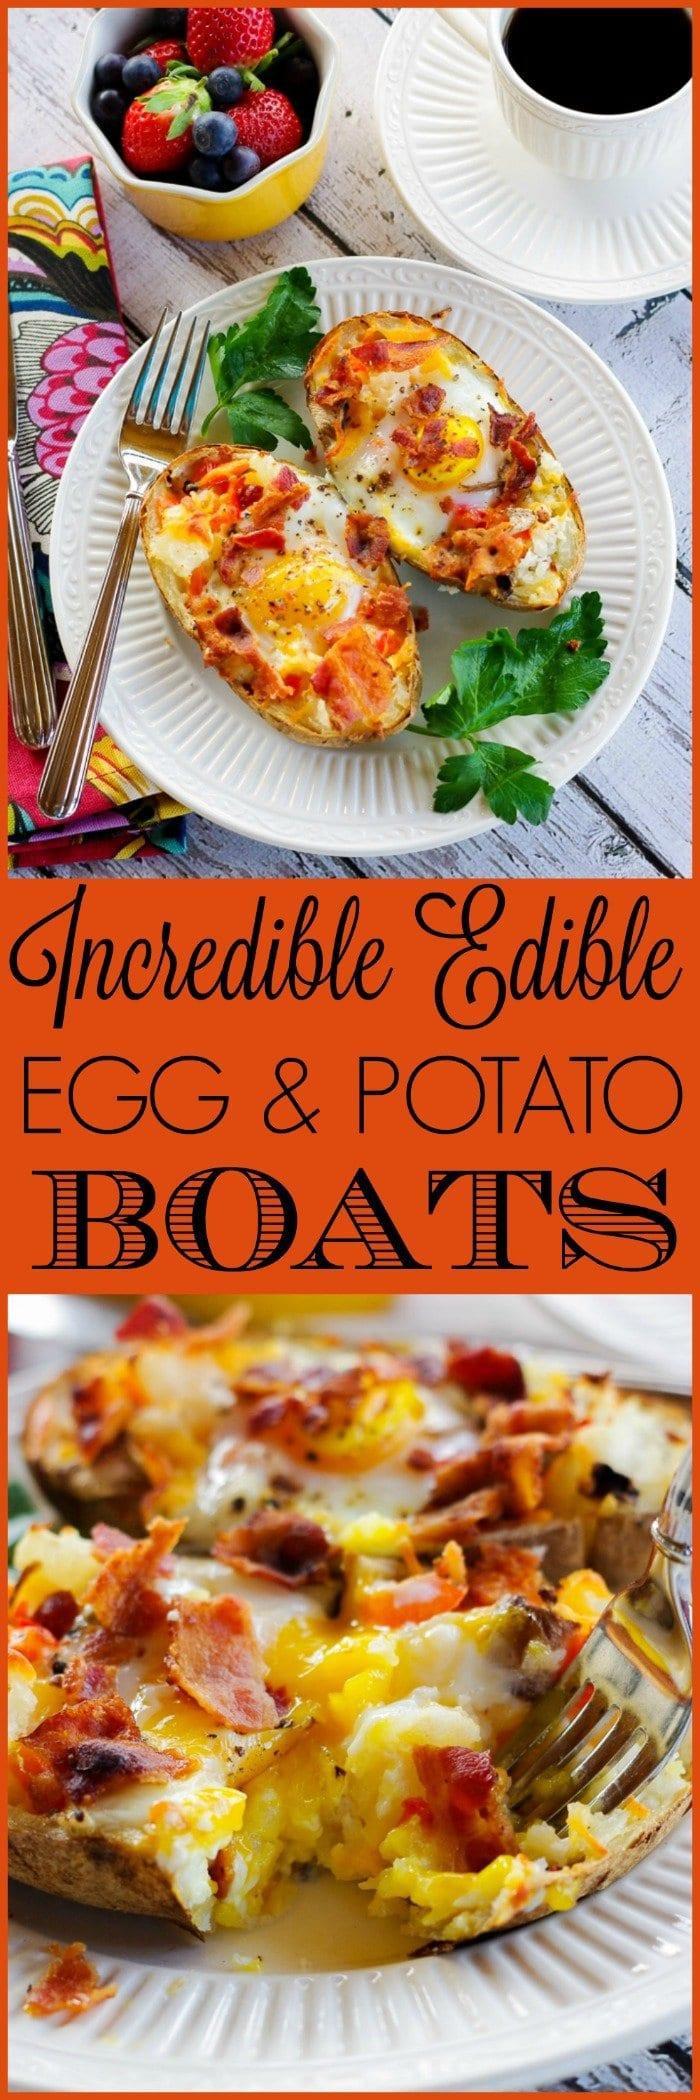 Incredible Edible Egg & Potato Boats | www.homeandplate.com | Transform last night